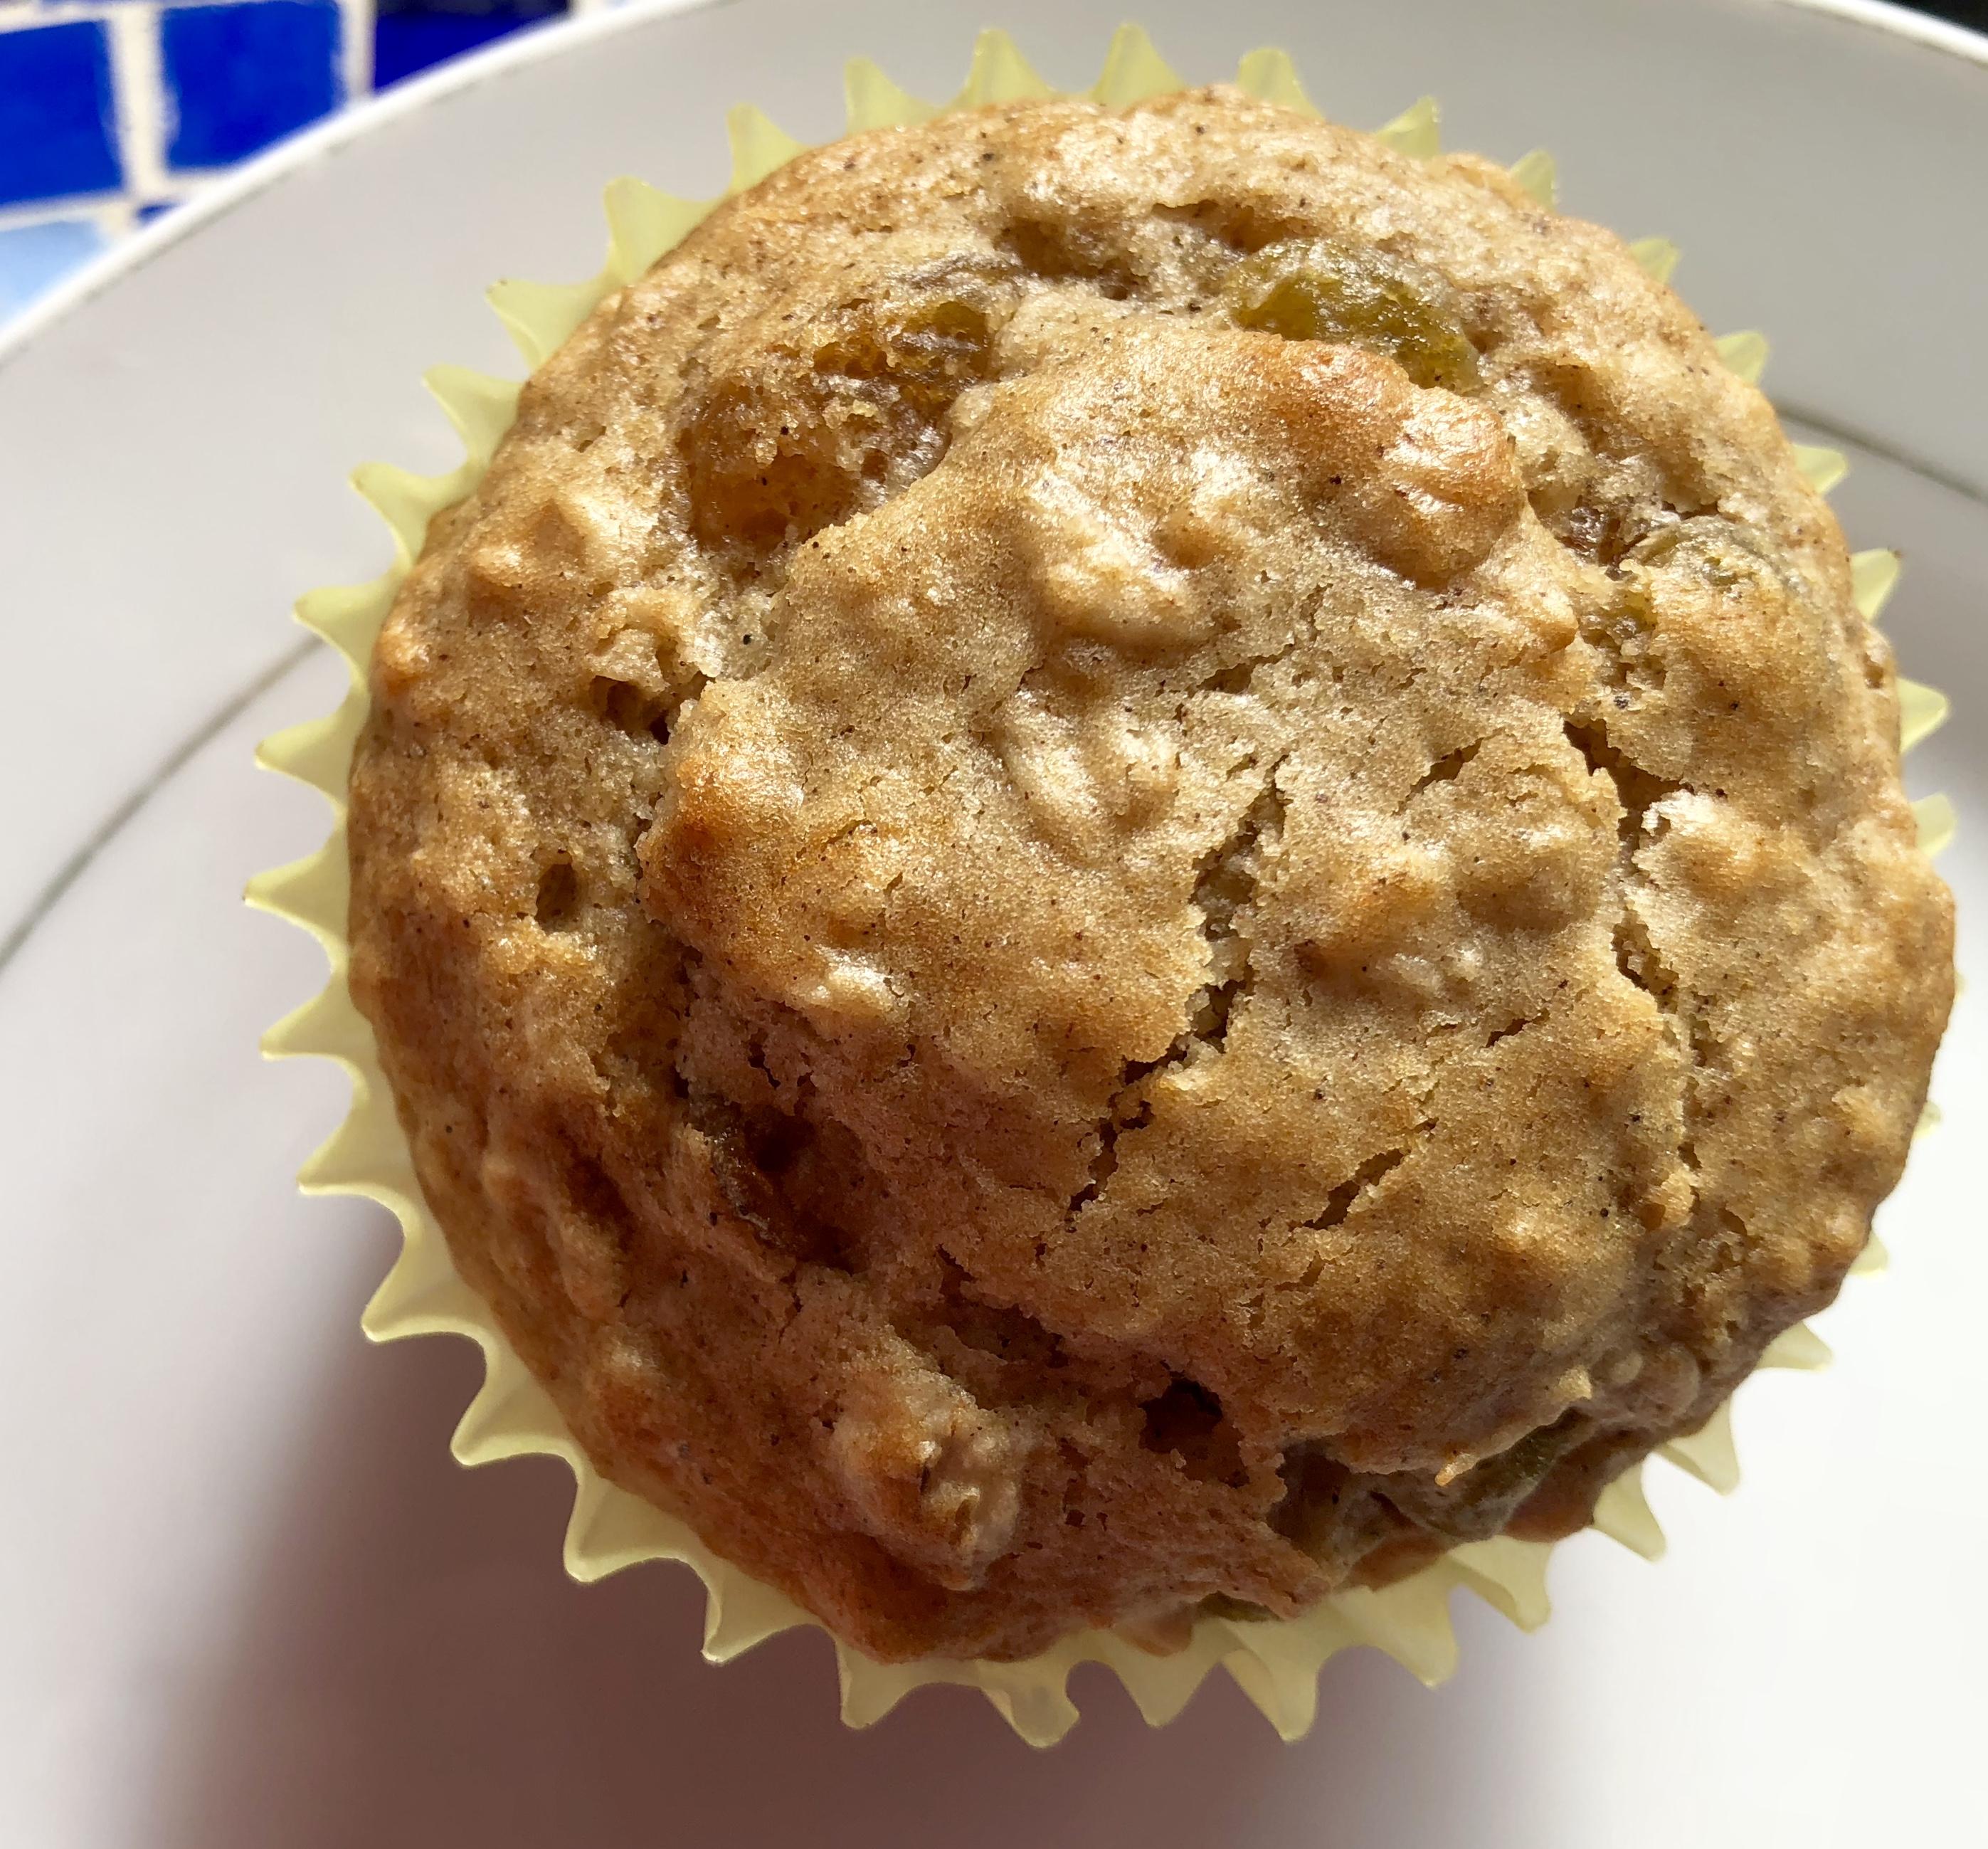 Oatmeal Golden Raisin Muffins from Alexandersmom.com